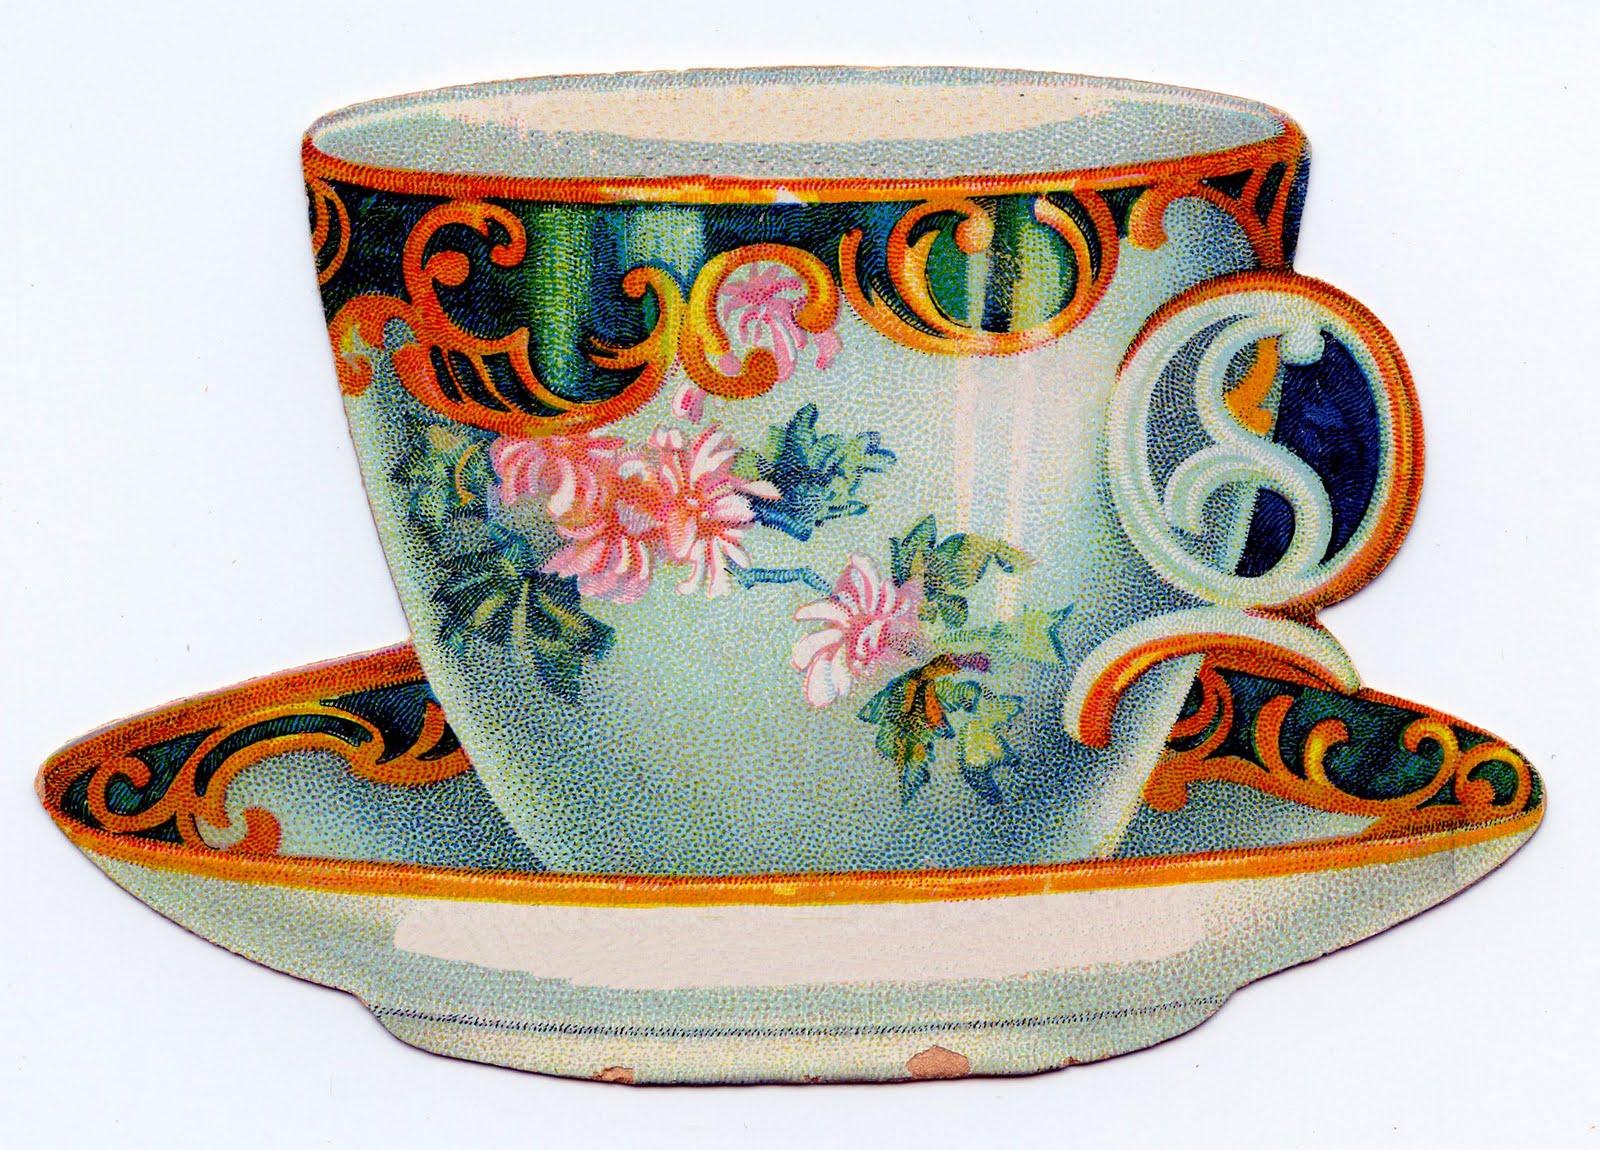 vintage teacup tea cup - photo #25